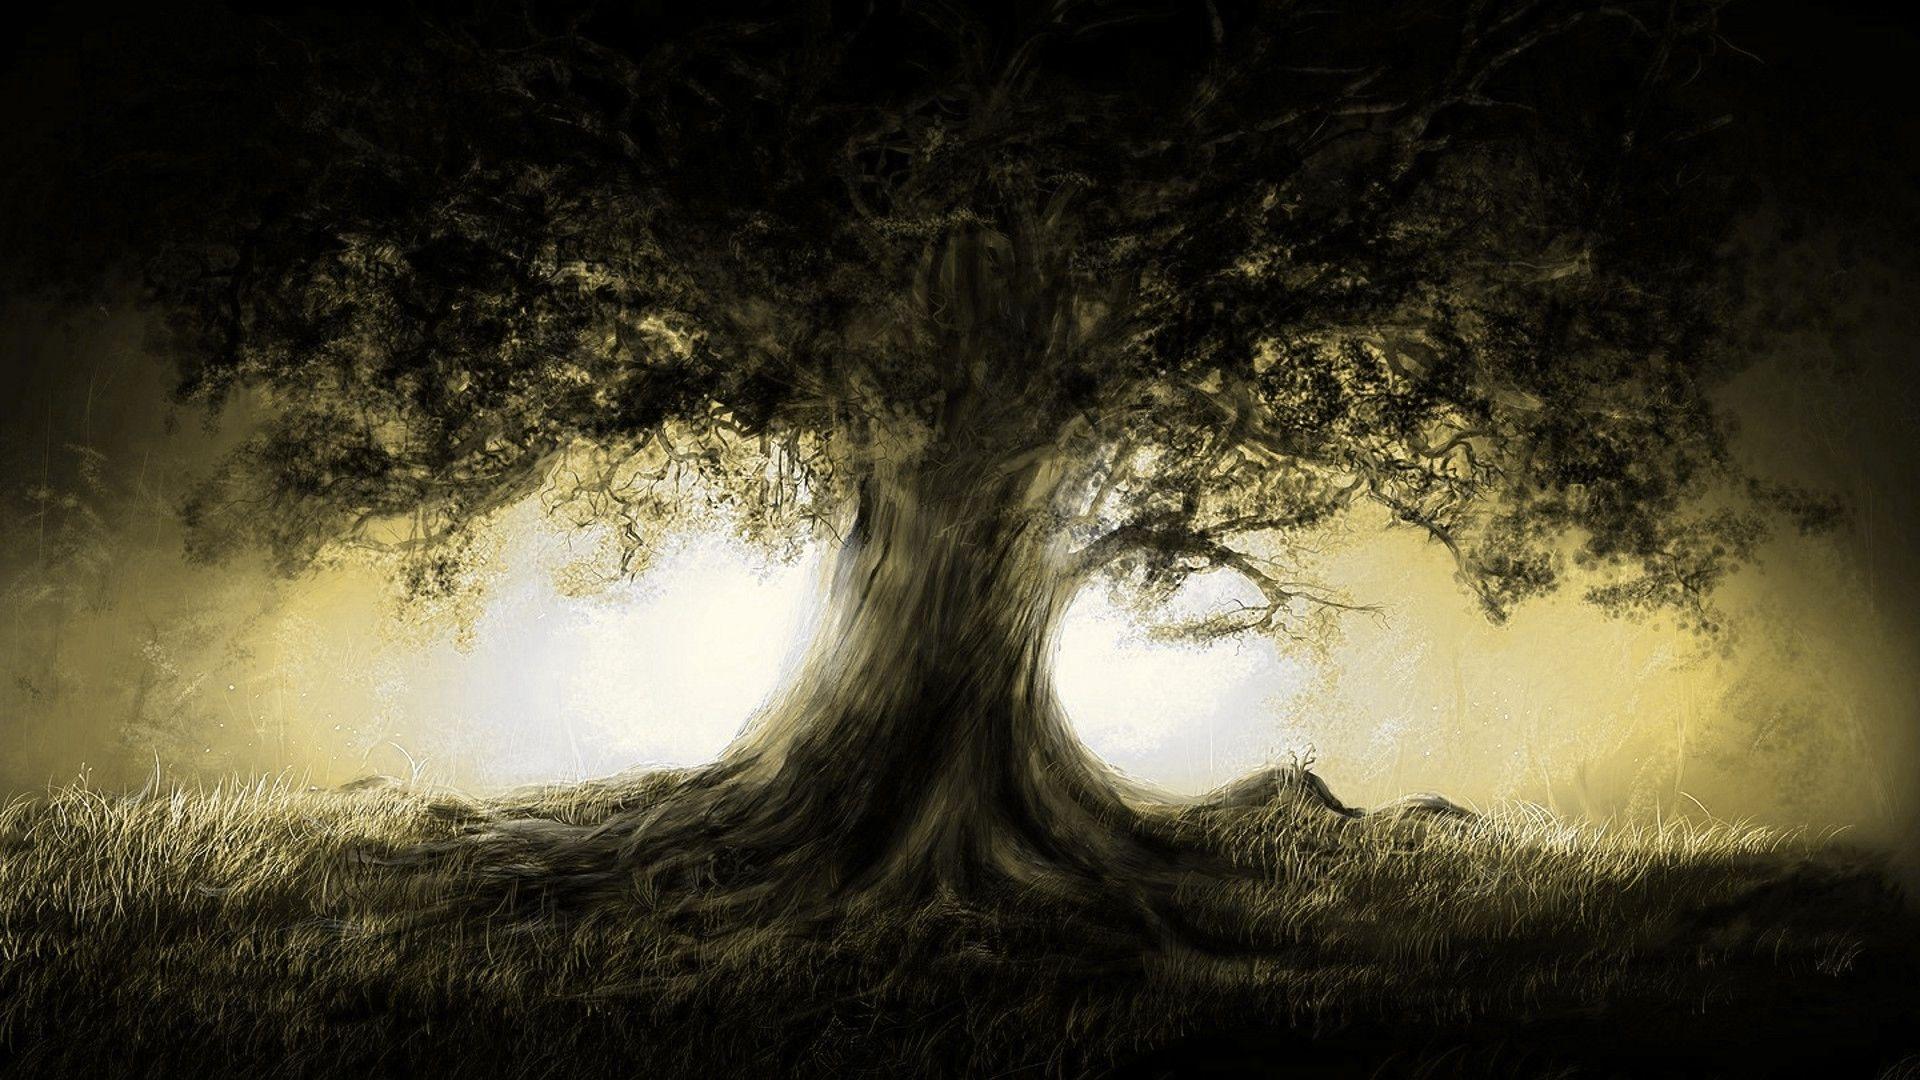 Picture Trees Foreground Dark Background Light Download Wallpapers Download Light Nature Trees Dark Gold Fantasy A Dark Fantasy Art Dark Fantasy Fantasy Art